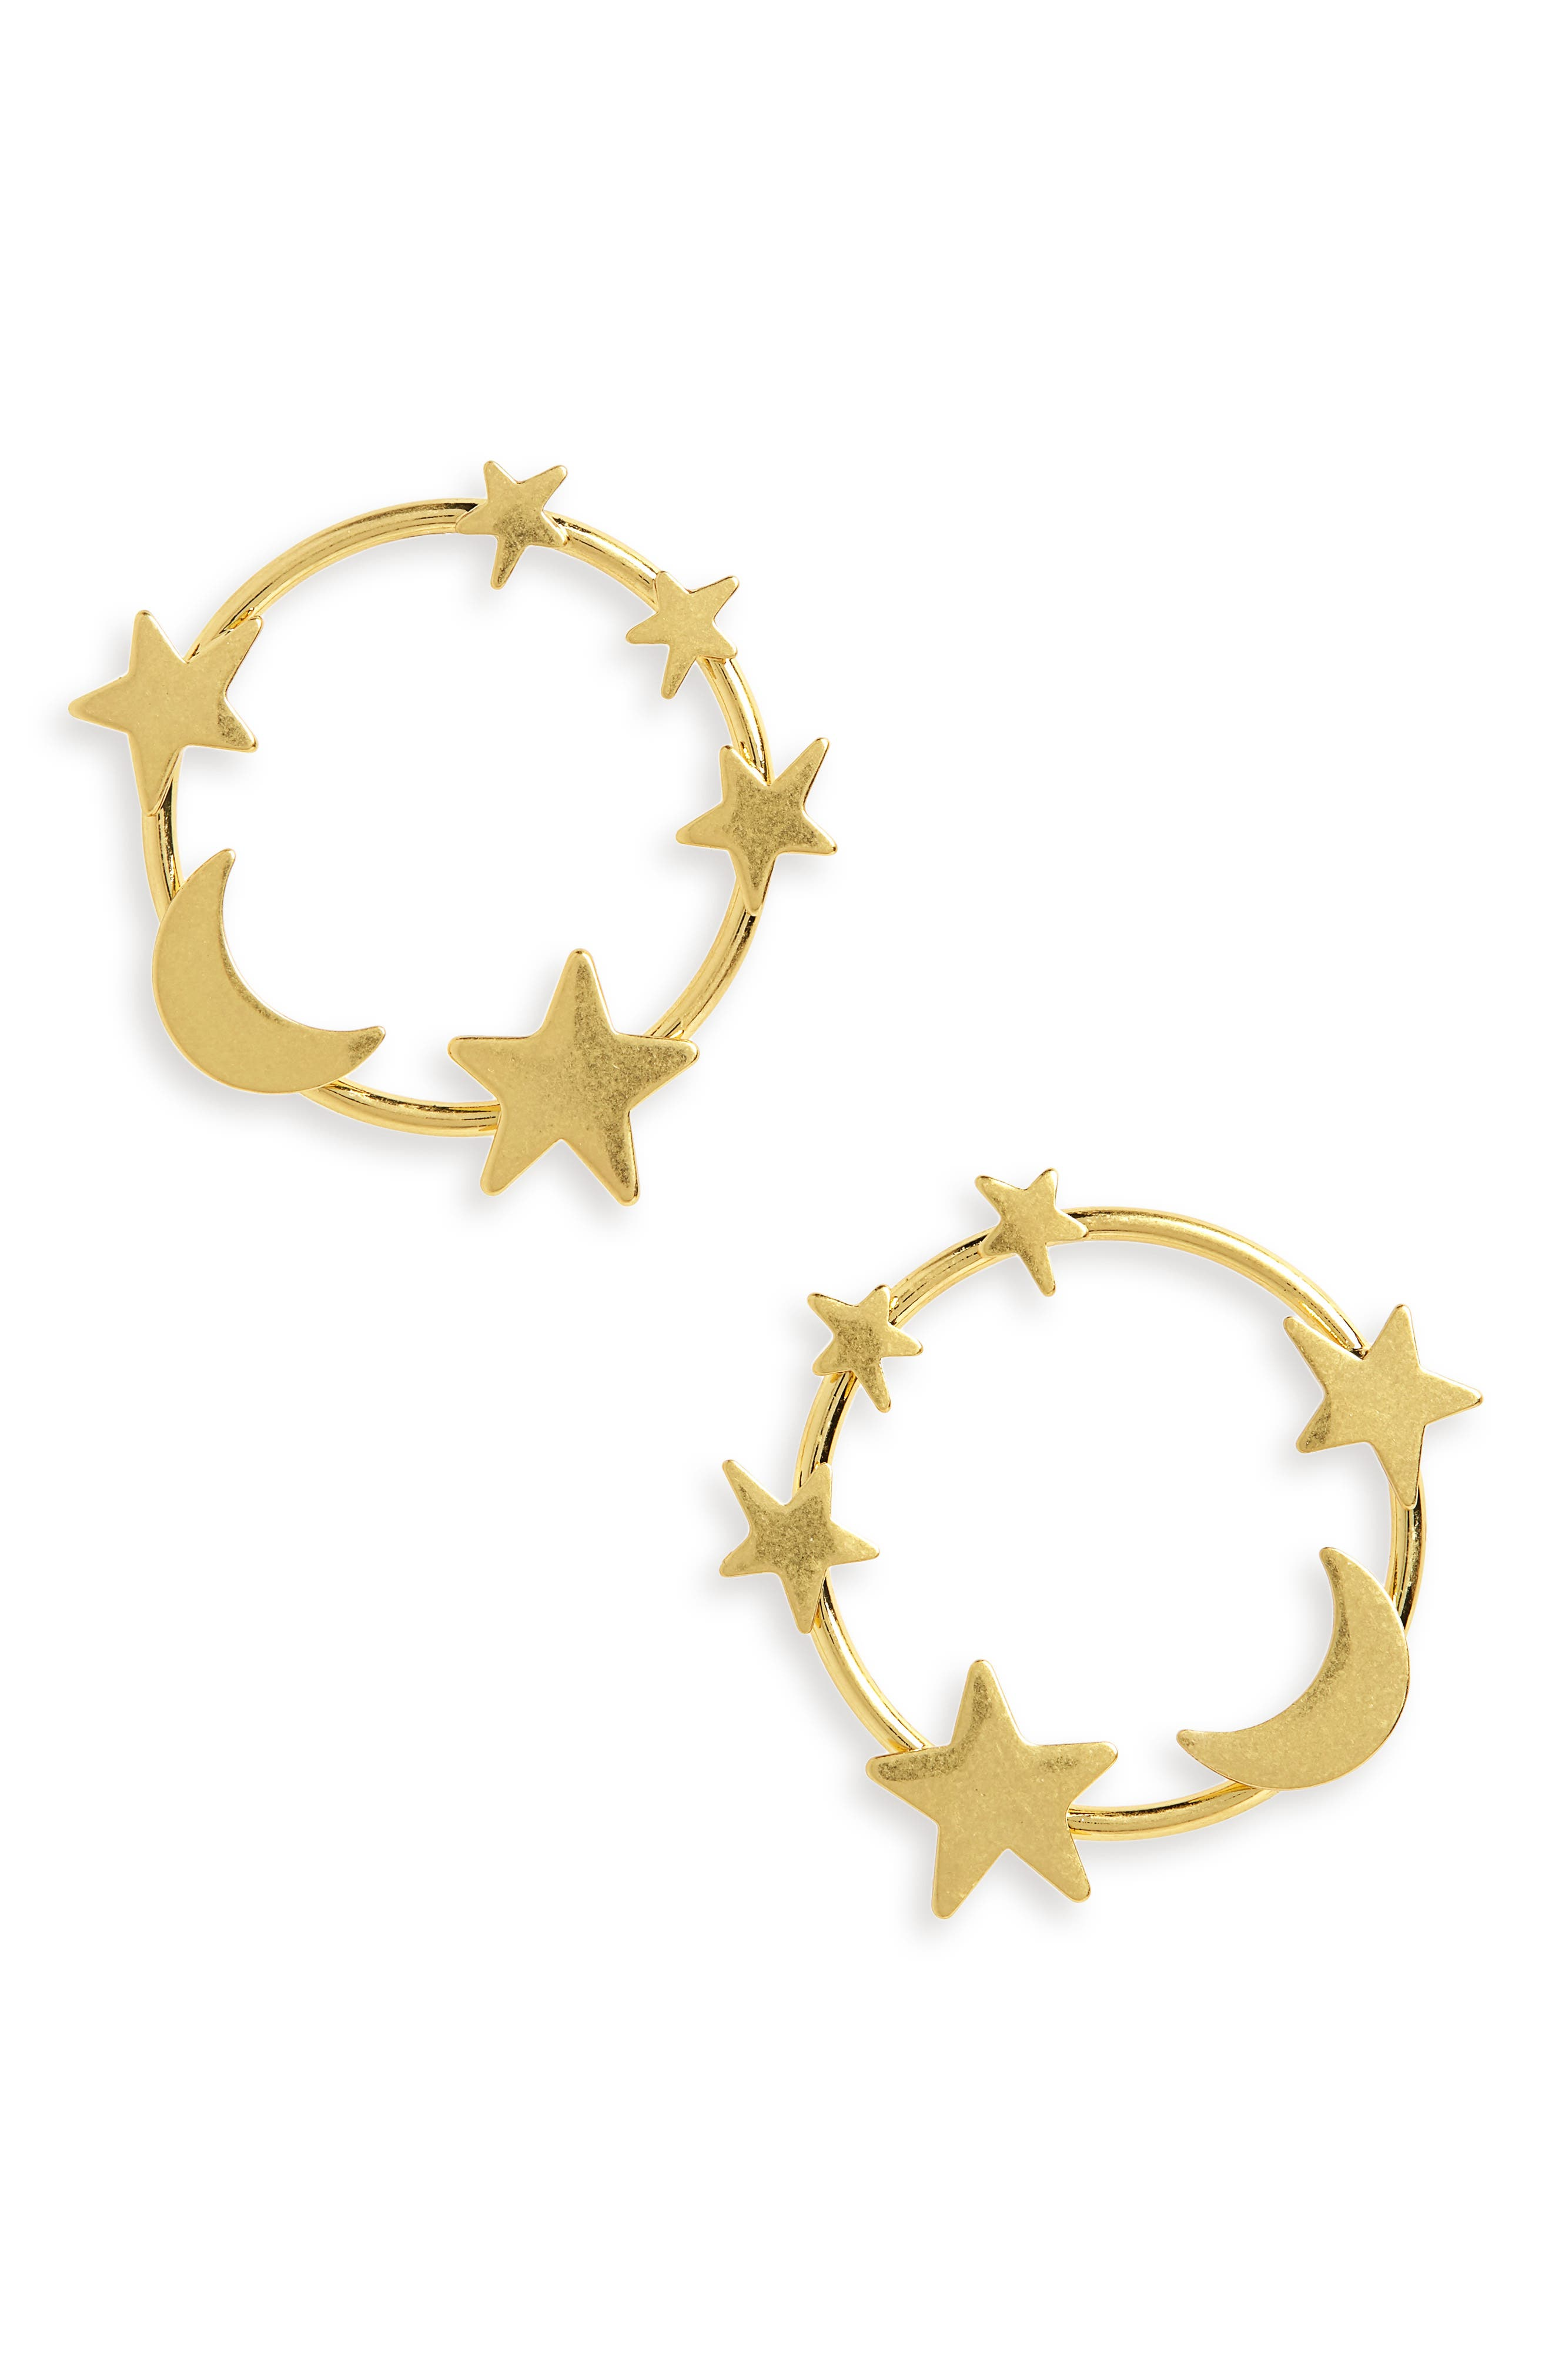 Star & Moon Hoop Earrings,                             Main thumbnail 1, color,                             VINTAGE GOLD